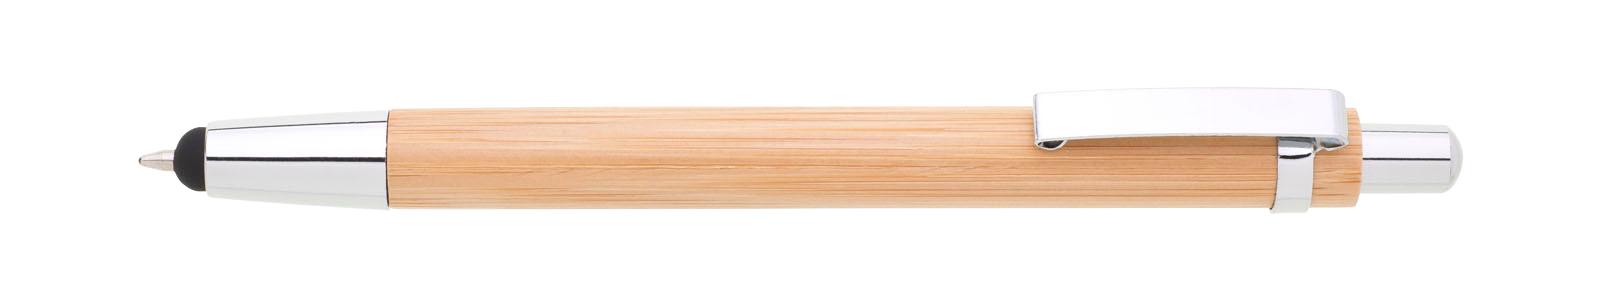 Propiska kov/bambus TURAL touch